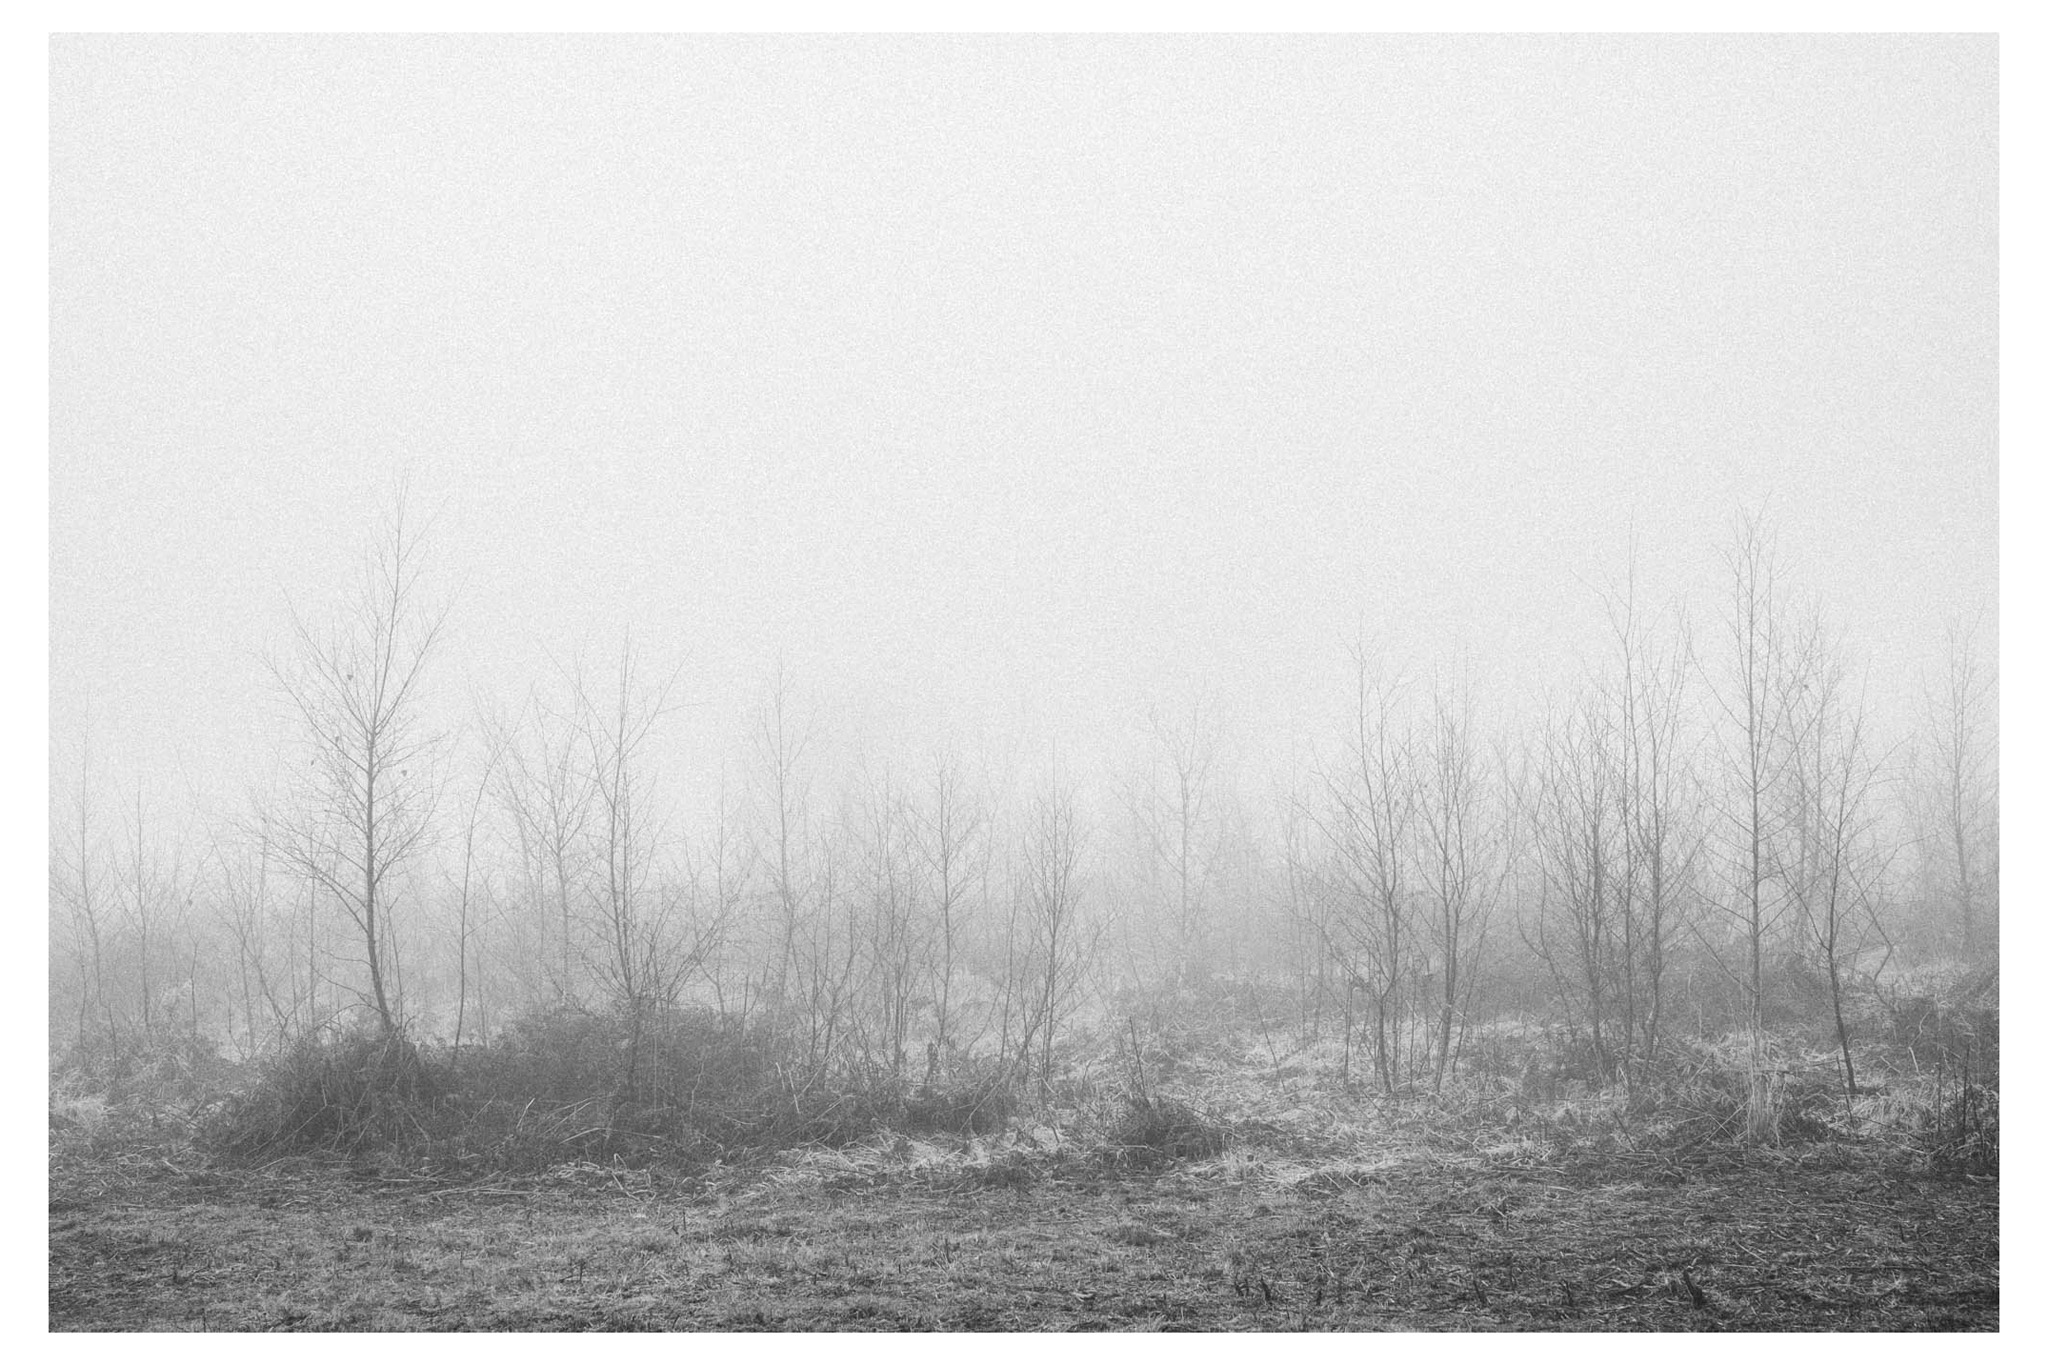 Mist_low-3067-2.jpg